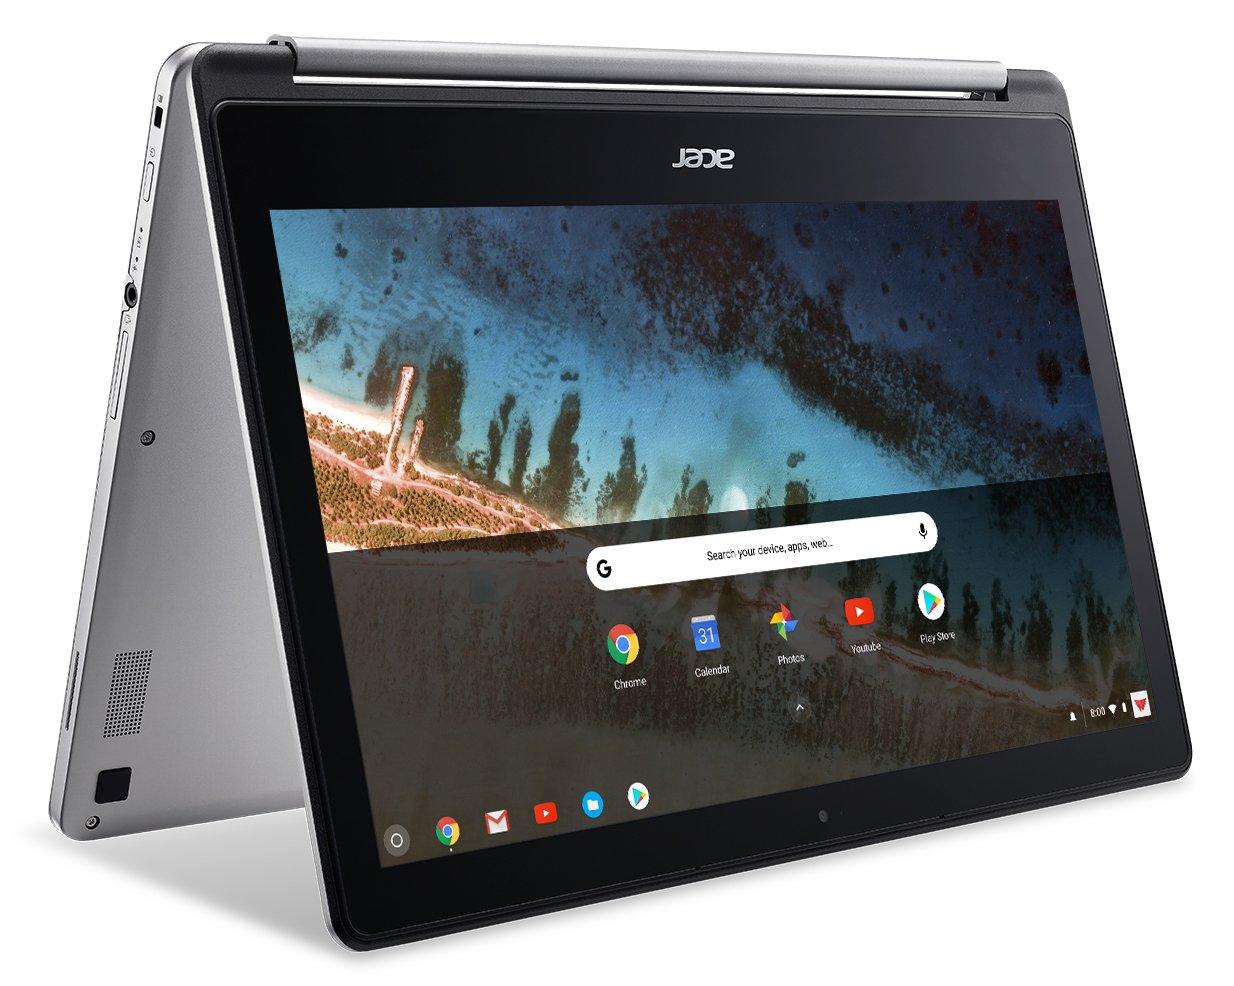 Acer Chromebook R 13 Convertible, 13.3-inch  Full HD Touch, MediaTek MT8173C, 4GB LPDDR3, 32GB, Chrome, CB5-312T-K5X4 by Acer